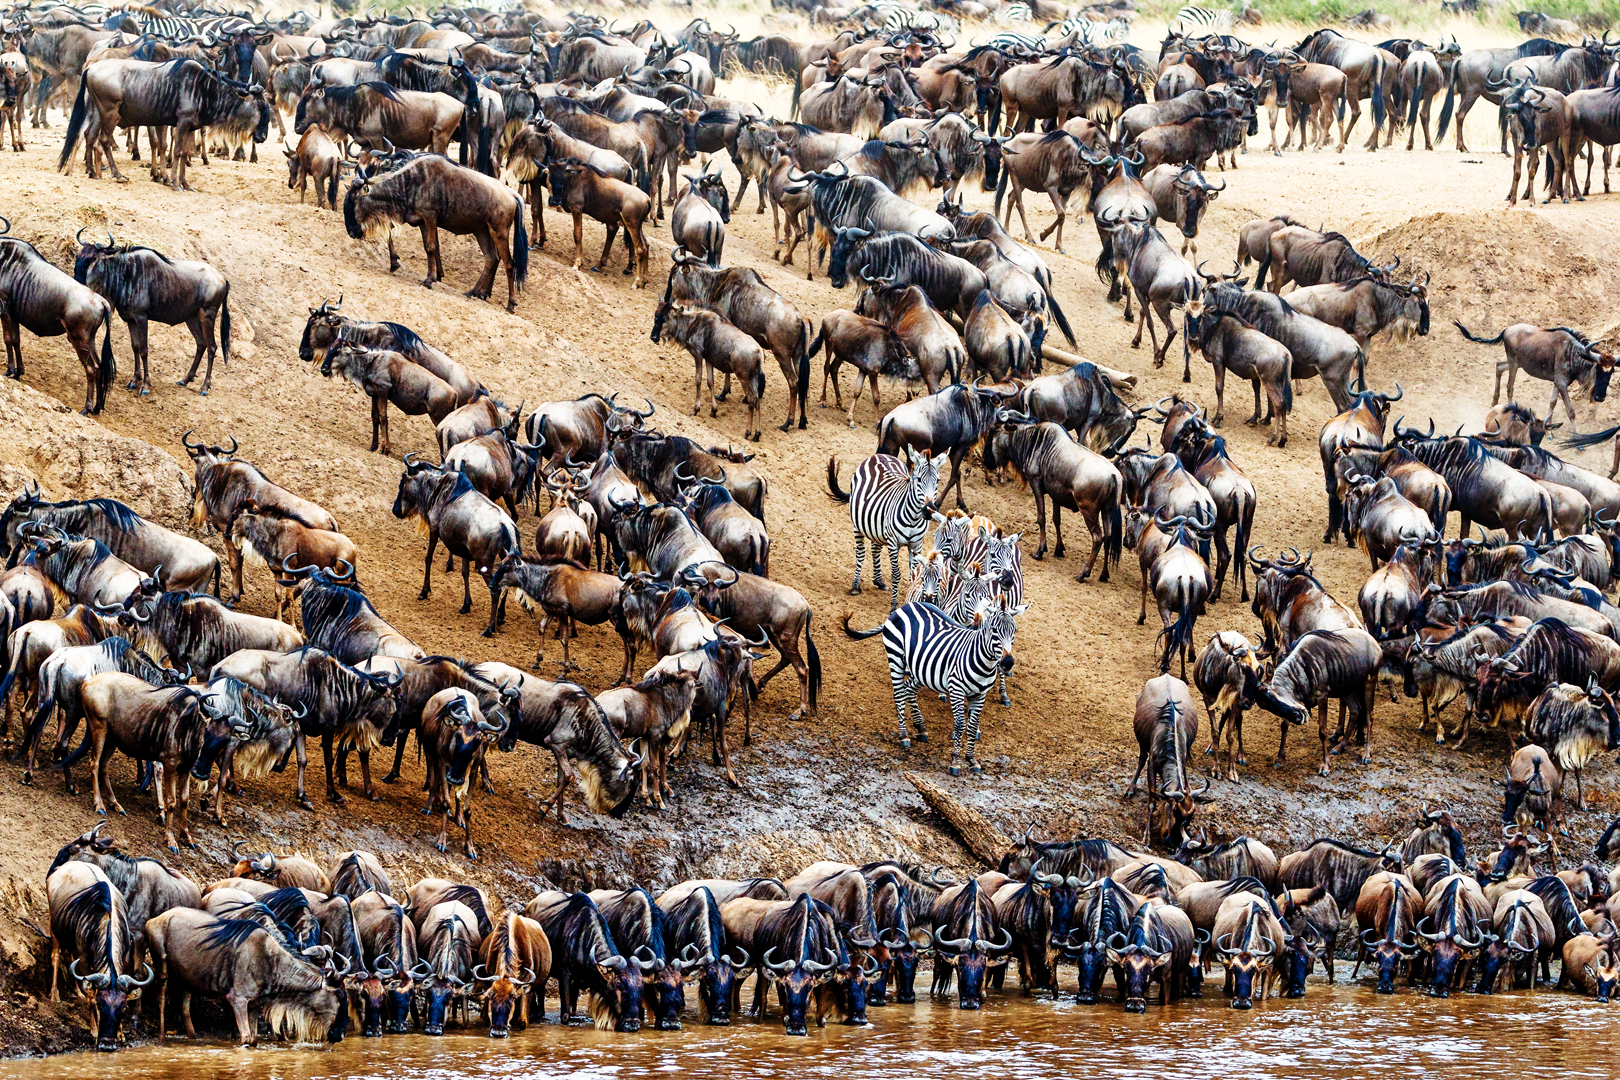 Zebra in Crowd of Wildebeest.jpg